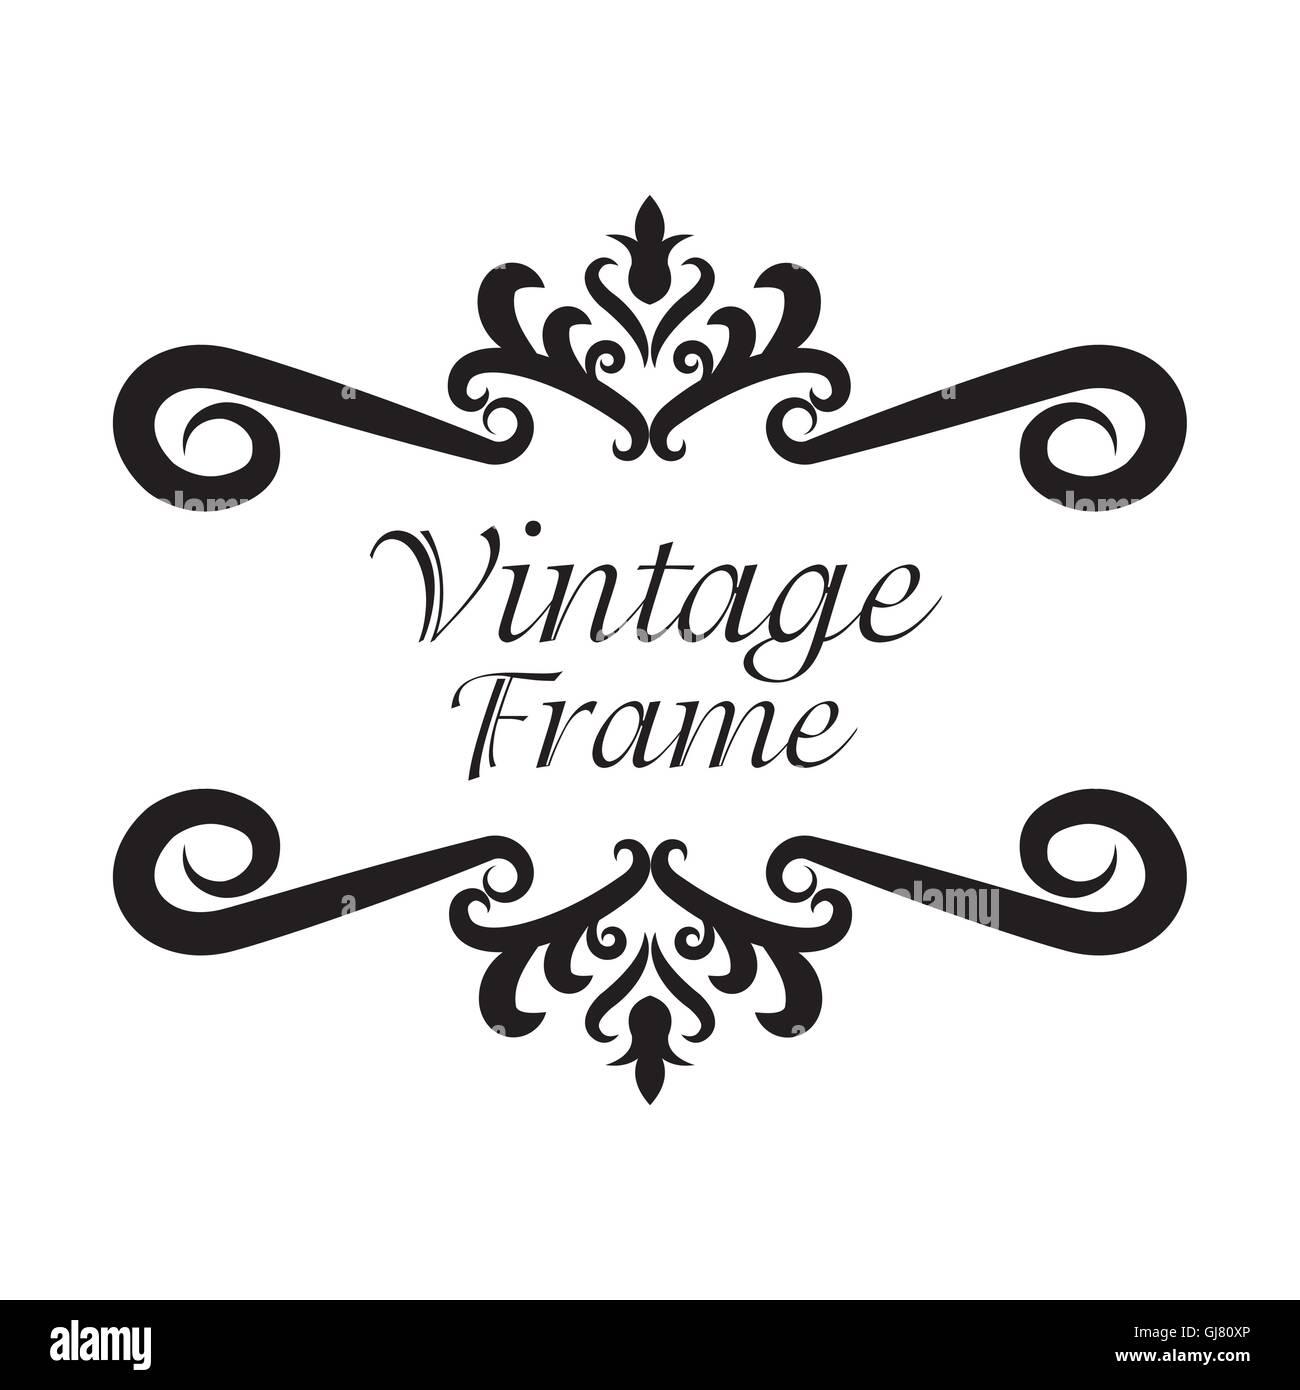 Vintage frame ornament icon - Stock Image